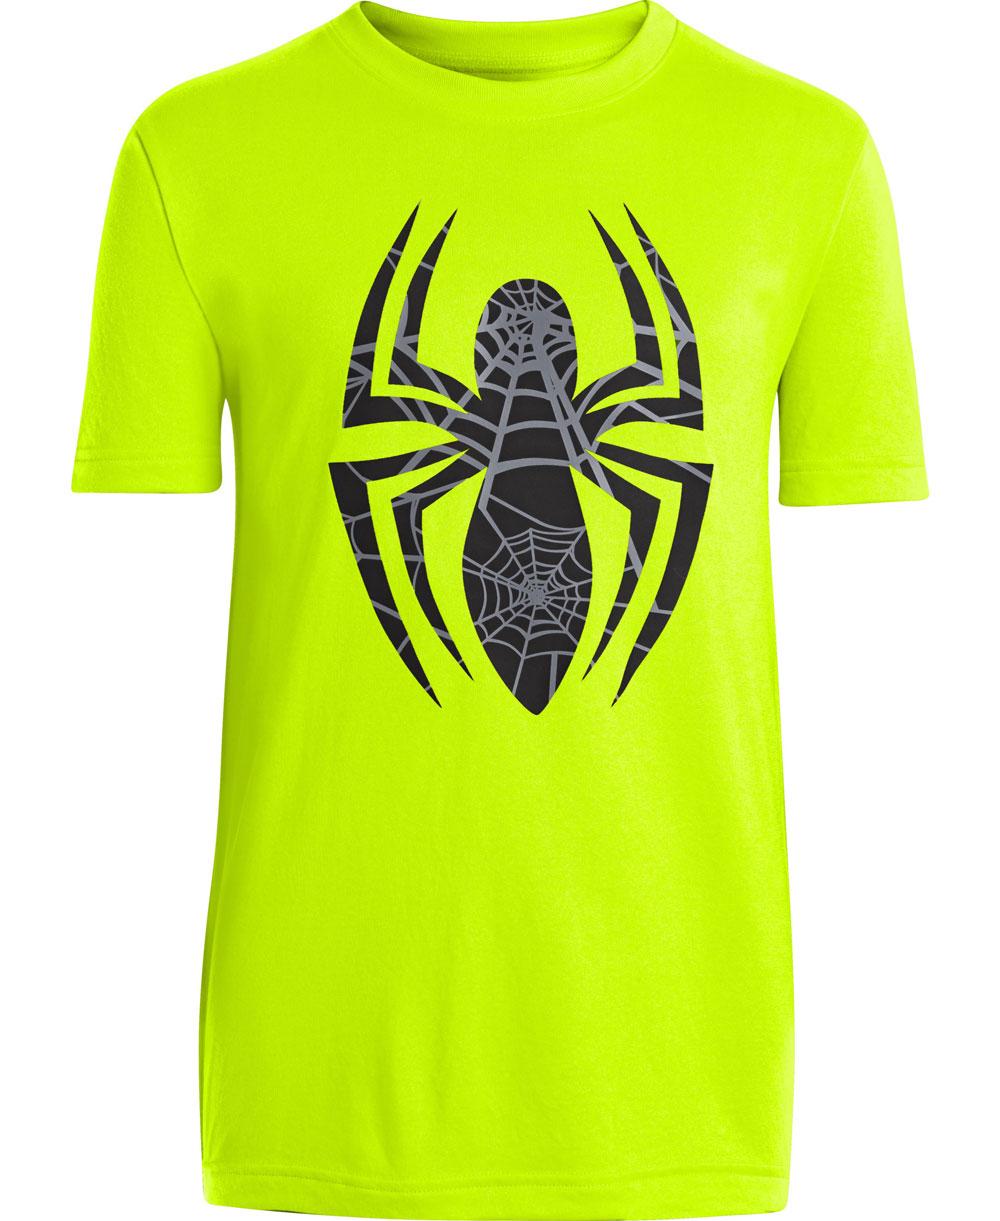 Alter Ego T-Shirt à Manches Courtes Enfant Spider-man